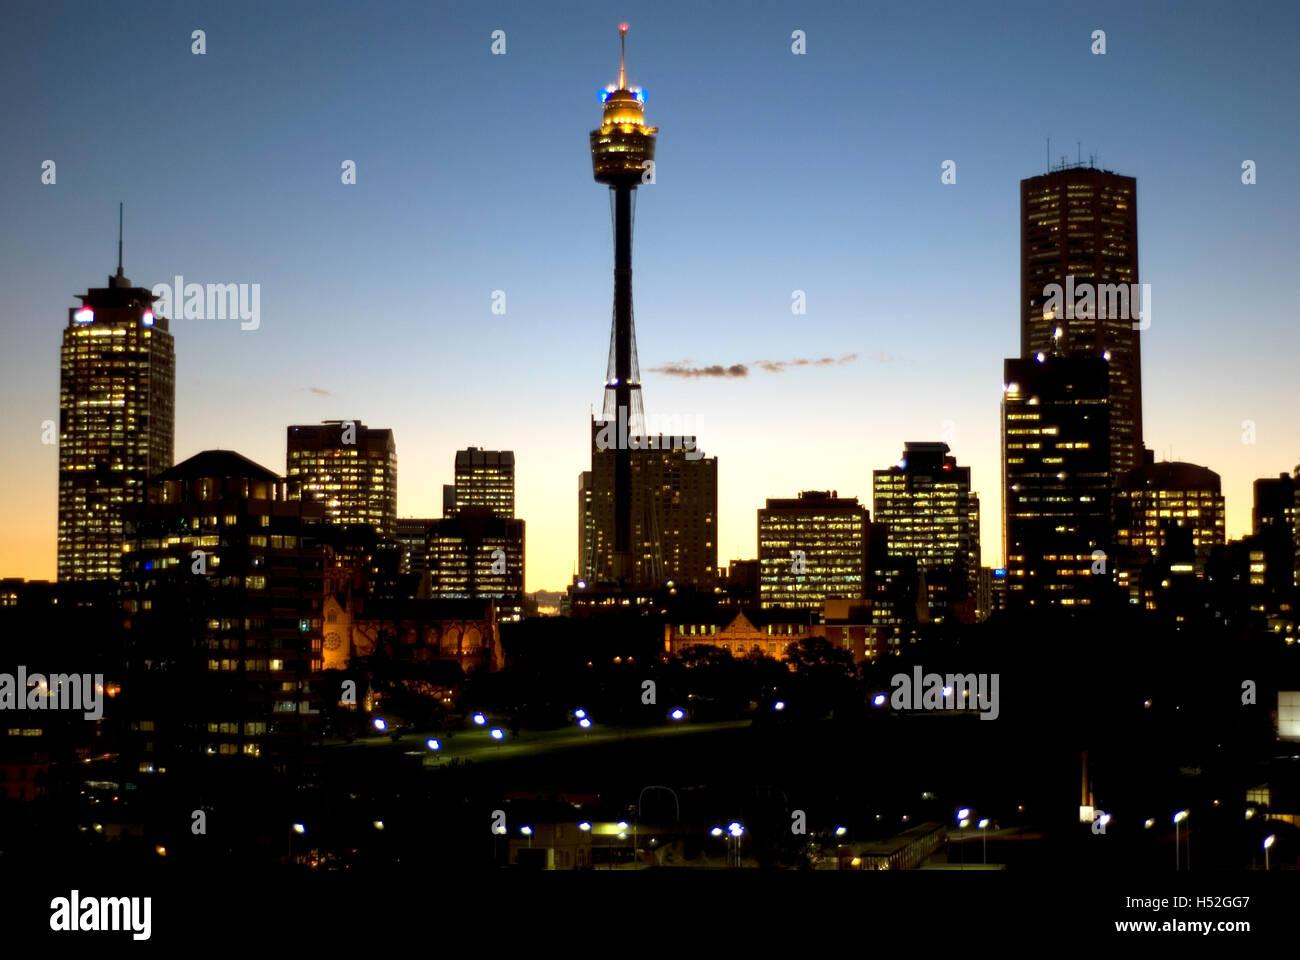 Australia, Sydney, city skyline from Darlinghurst - Stock Image